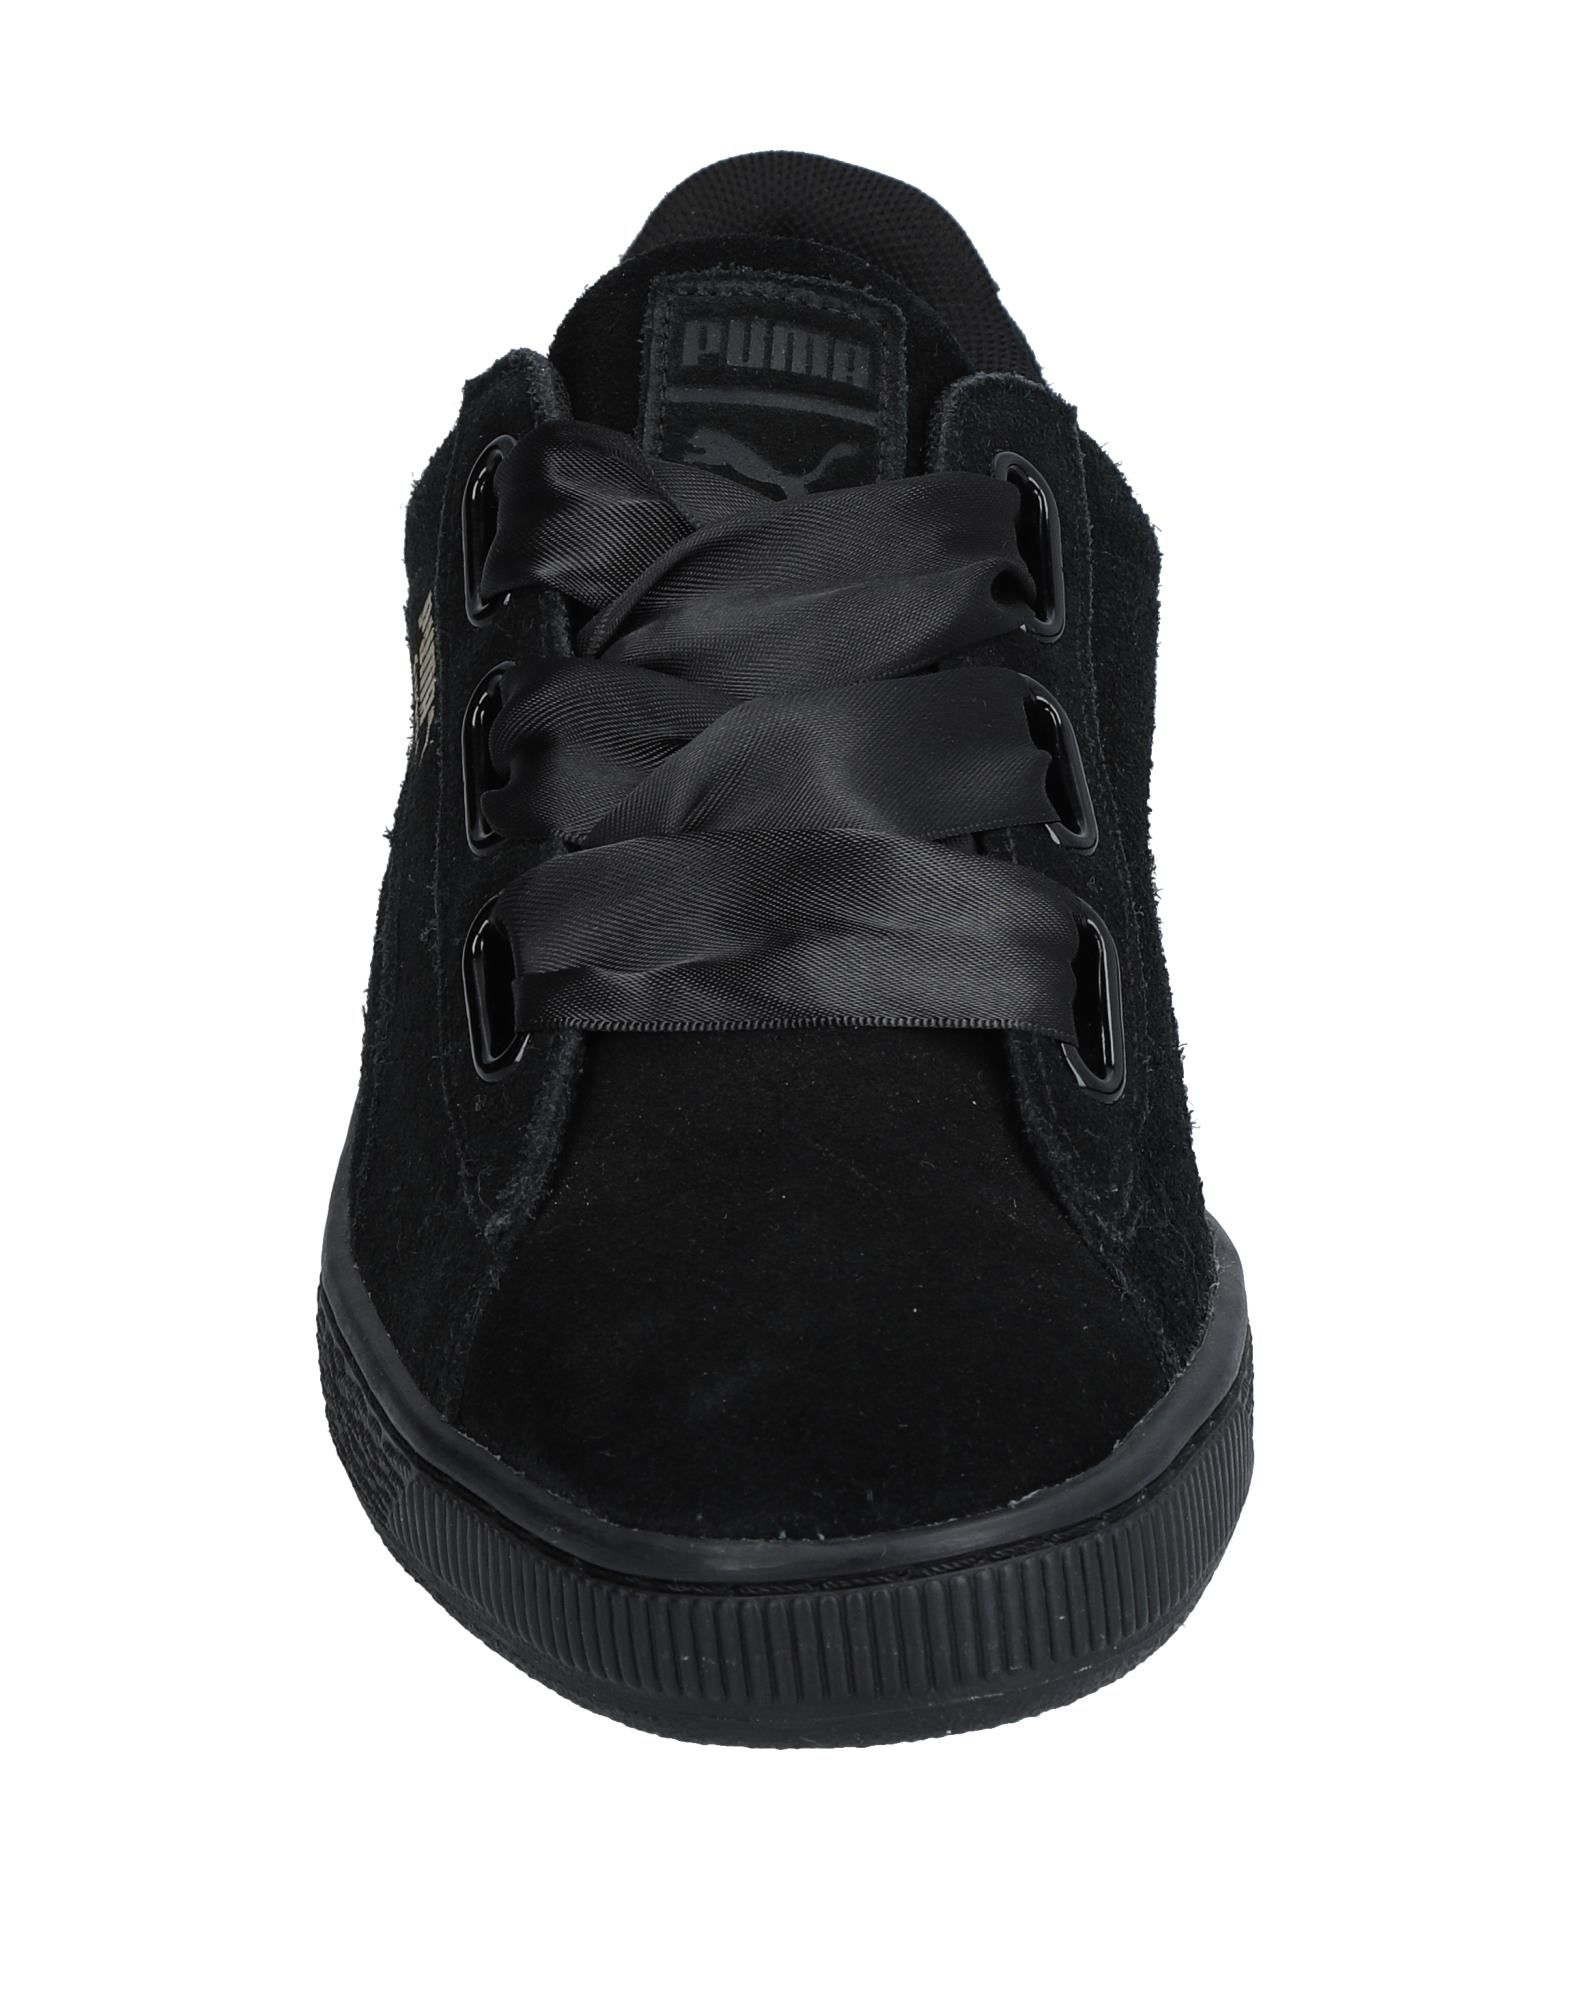 Puma Sneakers Damen beliebte  11537465LJ Gute Qualität beliebte Damen Schuhe f2f887